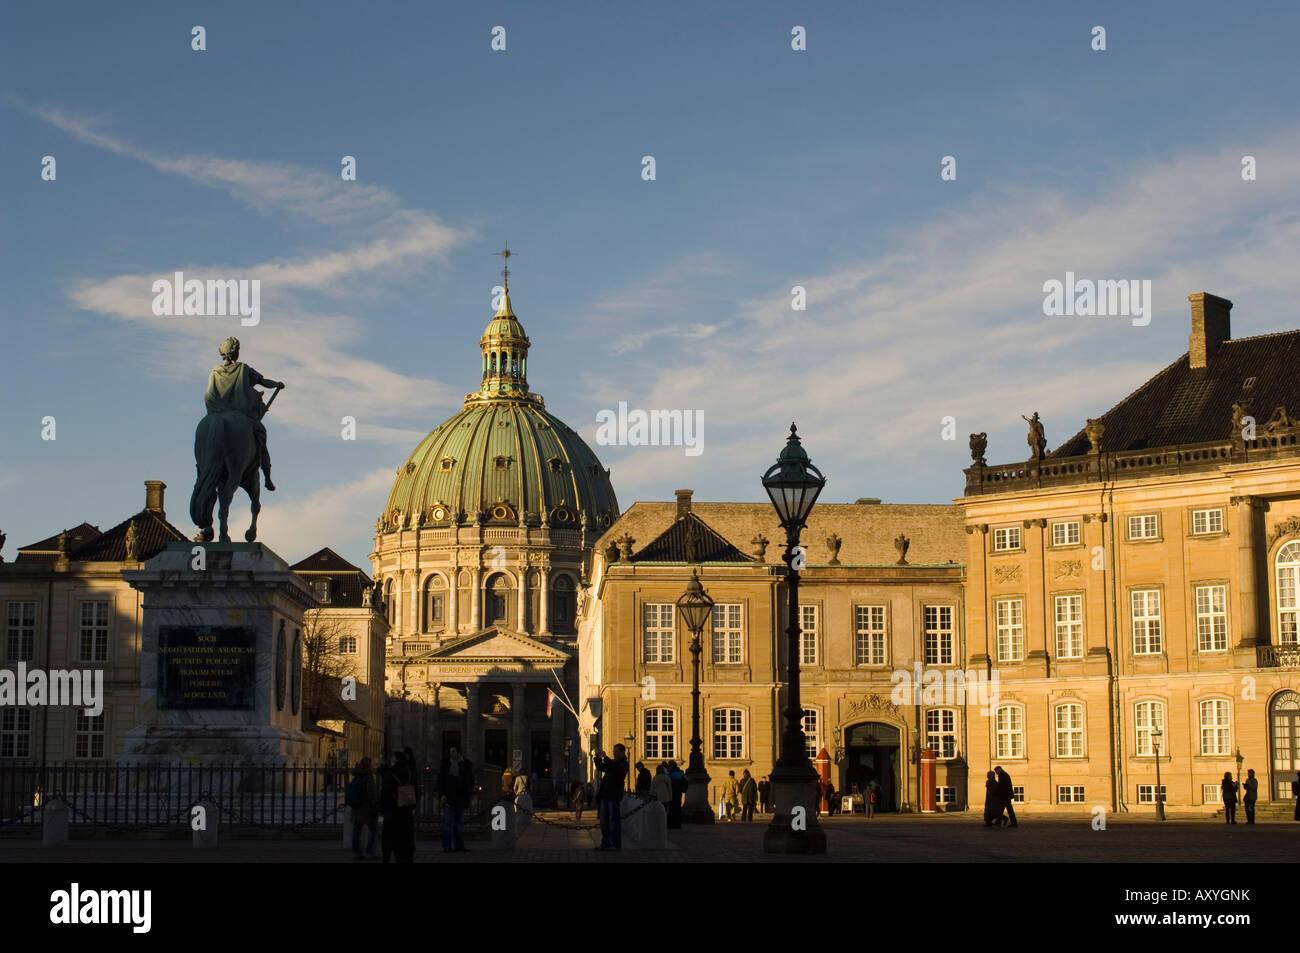 Frederik V statue and Frederikskirken (Marmorkirken) (Marble Church), Amalienborg, Copenhagen, Denmark, Scandinavia, - Stock Image